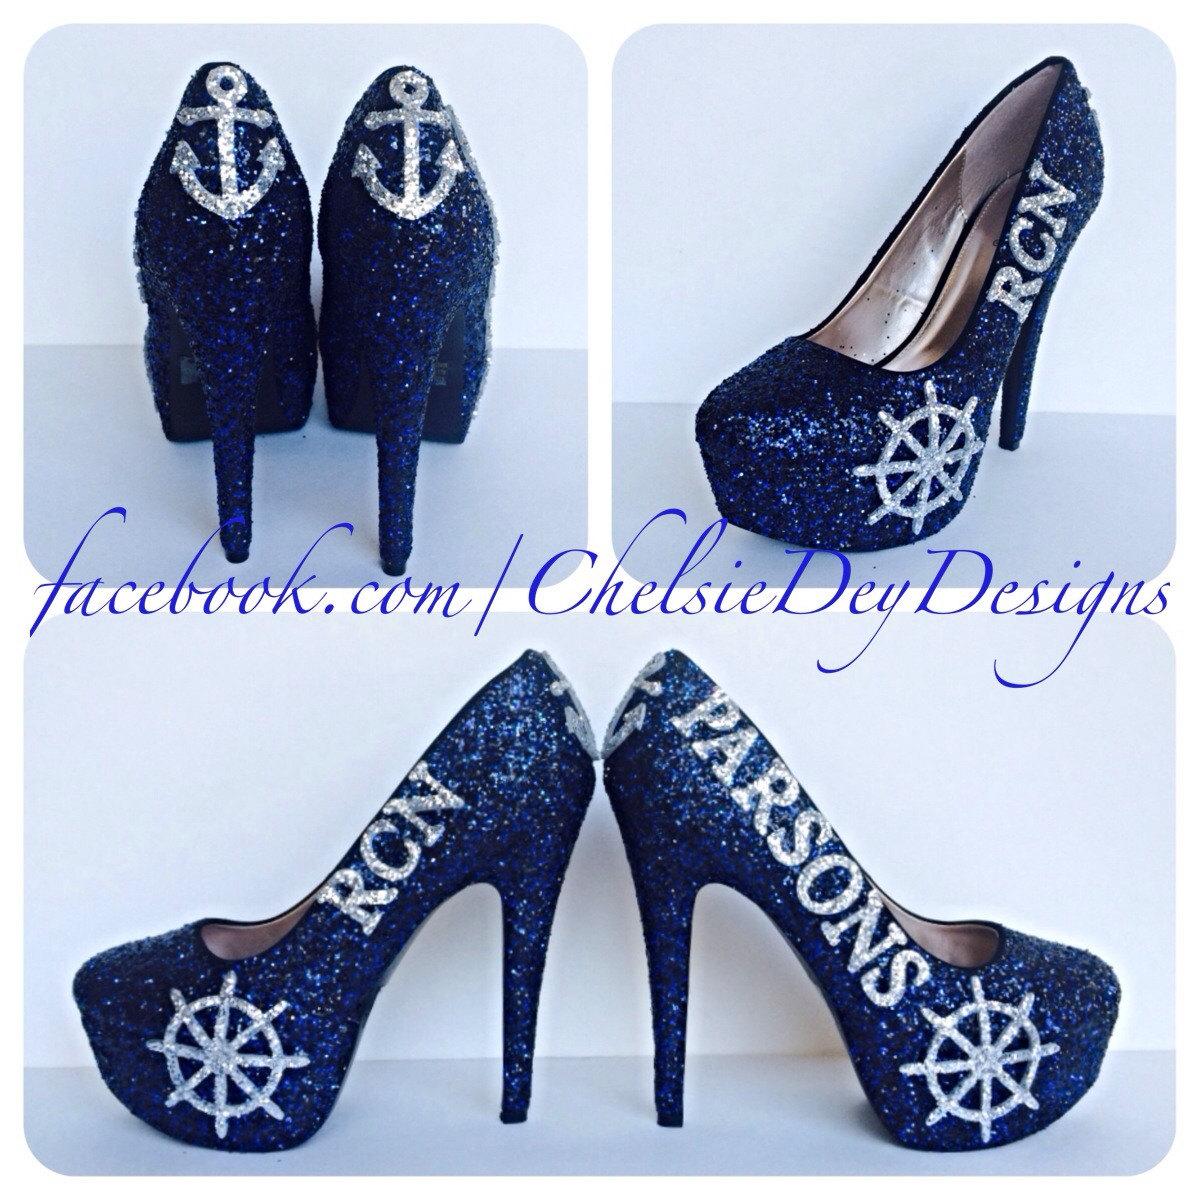 066c719335d Navy glitter high heels - dark blue military rcn pumps - silver wheel and  anchor heels